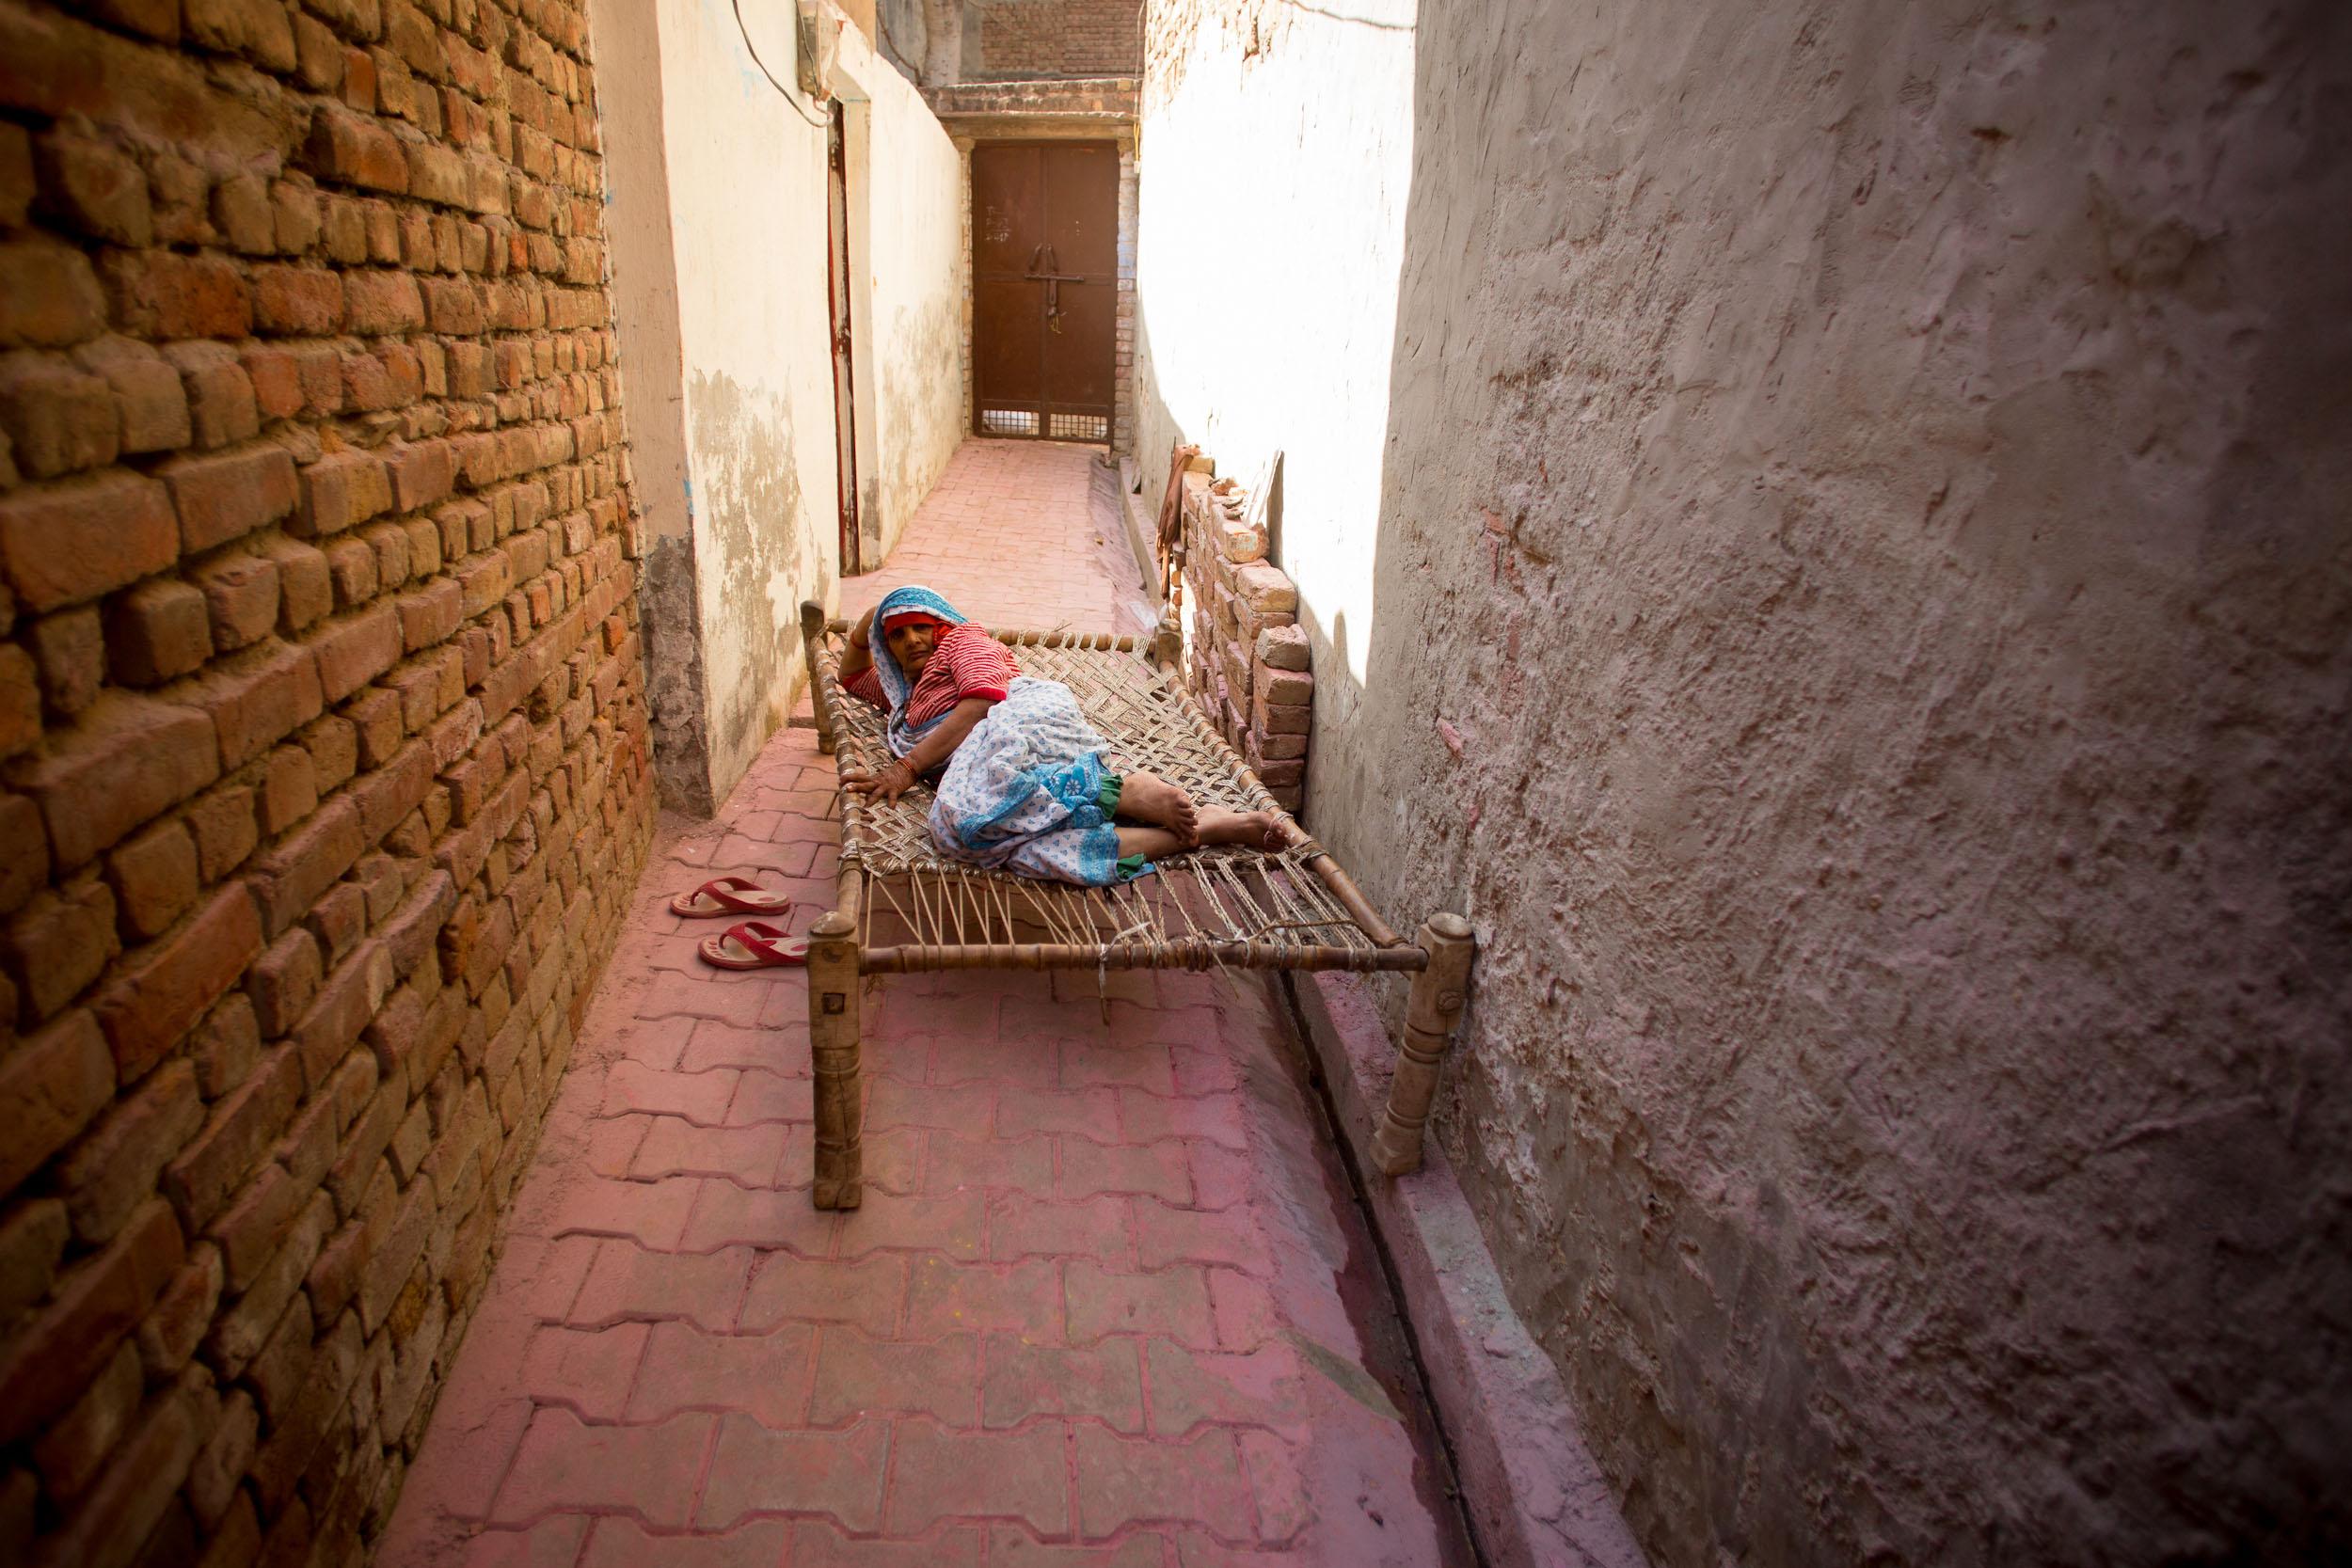 Sindhur_Photography_Travel_People_Holi-24.JPG